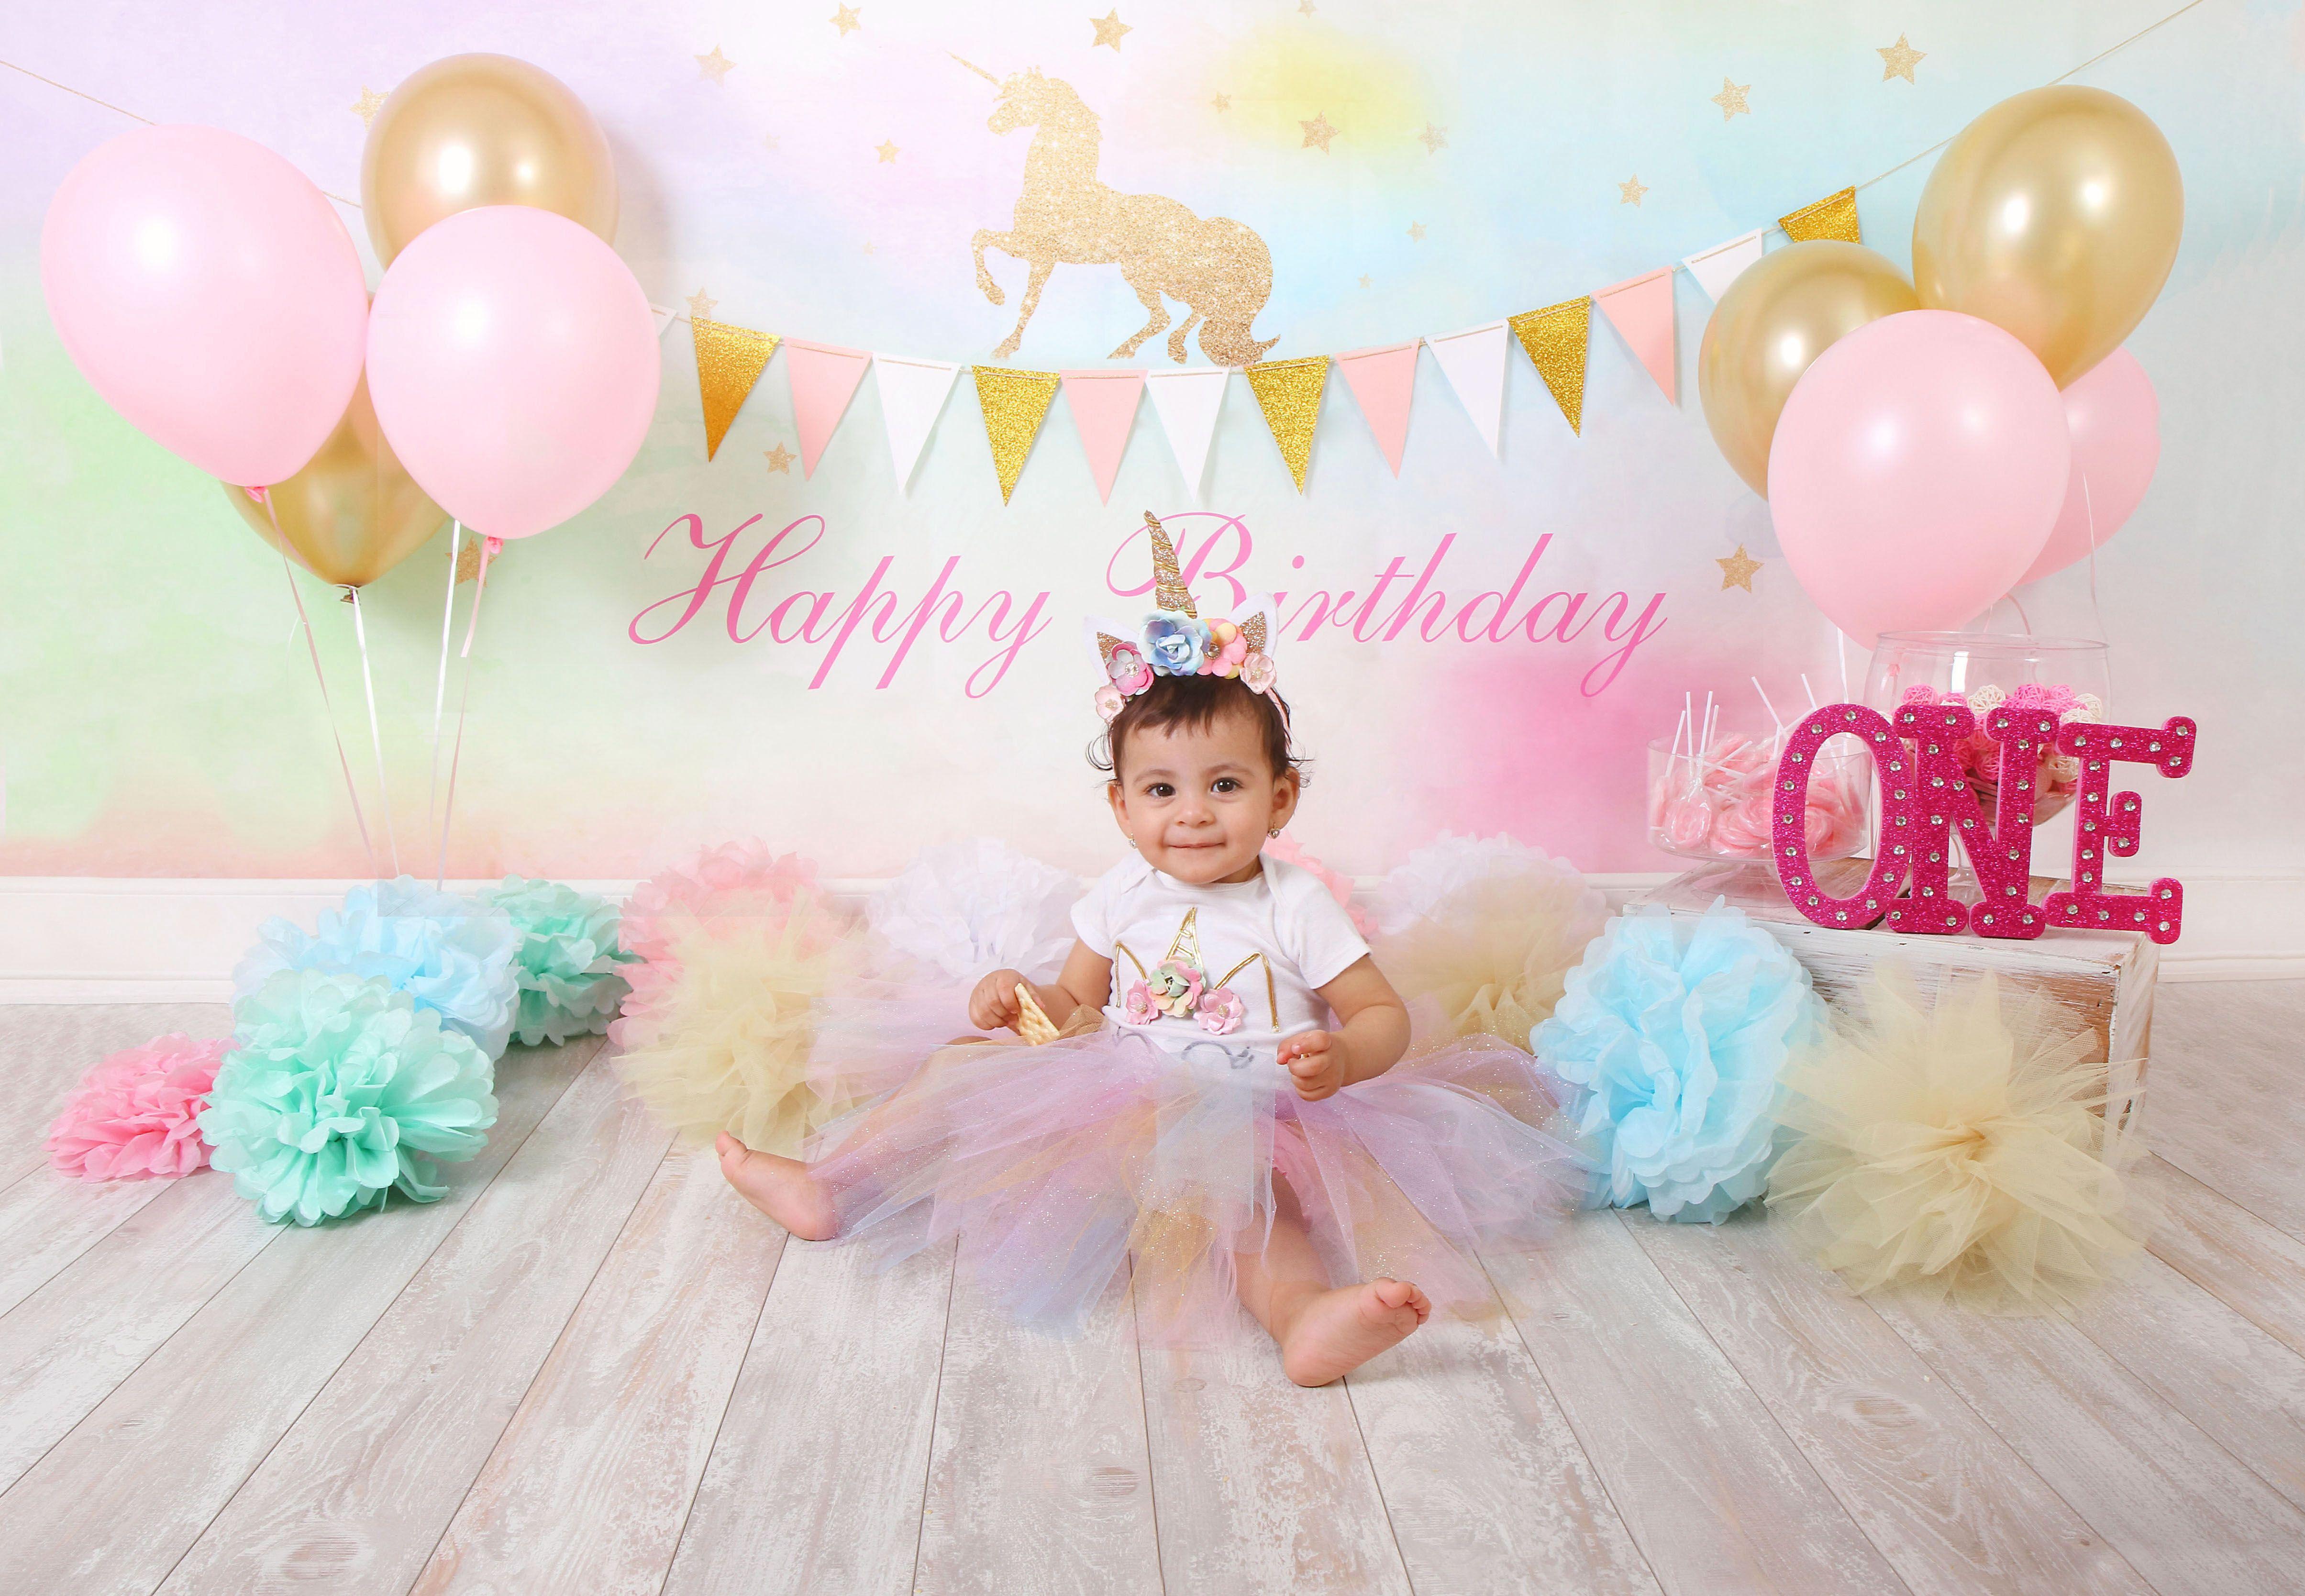 Smash Cake Fotografo En NYC Blue Birthday 1 Year Olds